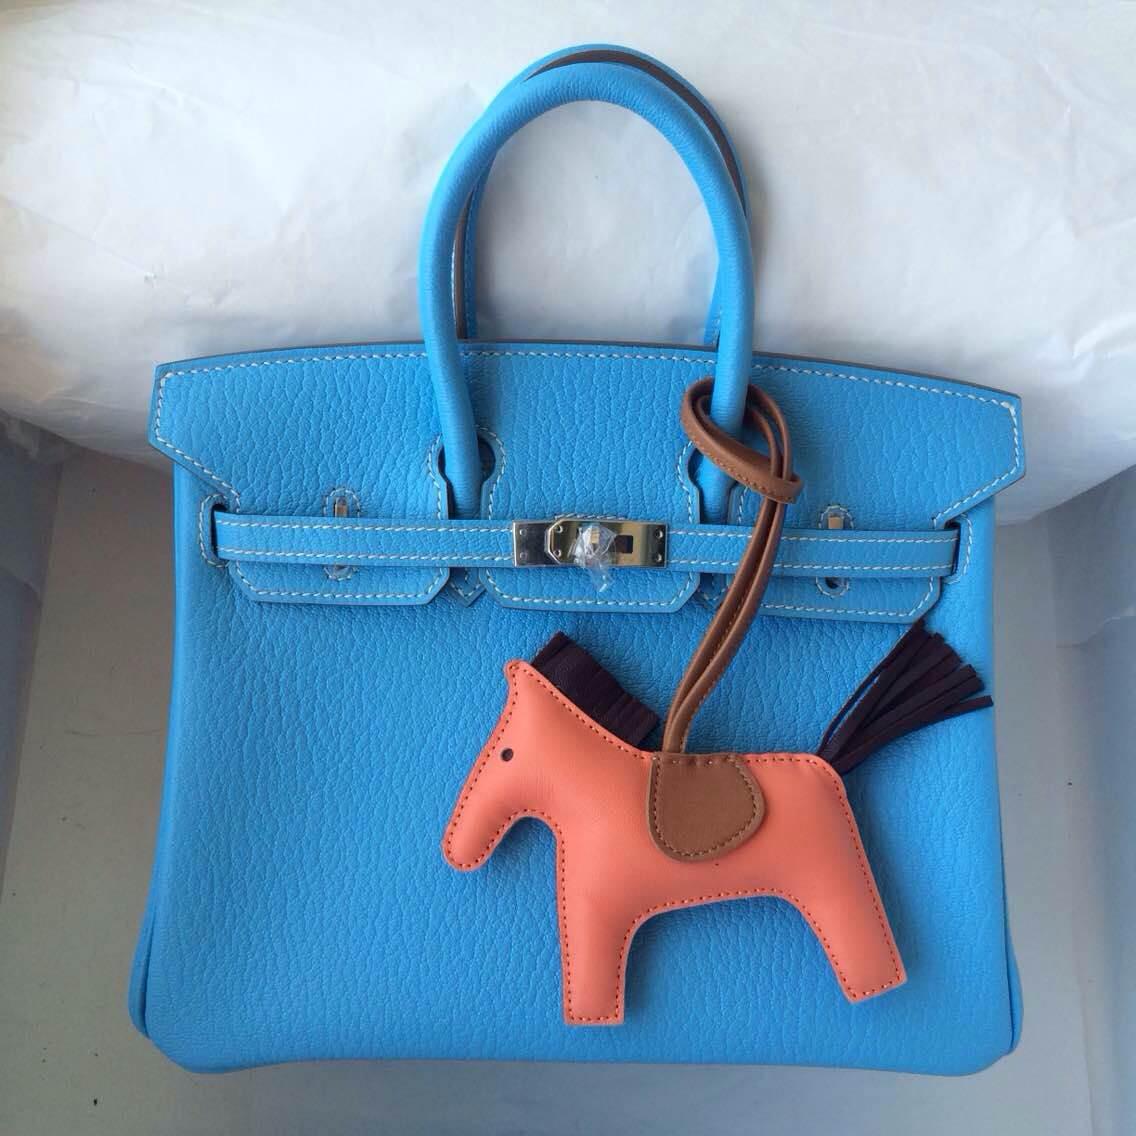 25cm Birkin Bag 7N Blue Paradise Color France Chevre Leather Silver Hardware